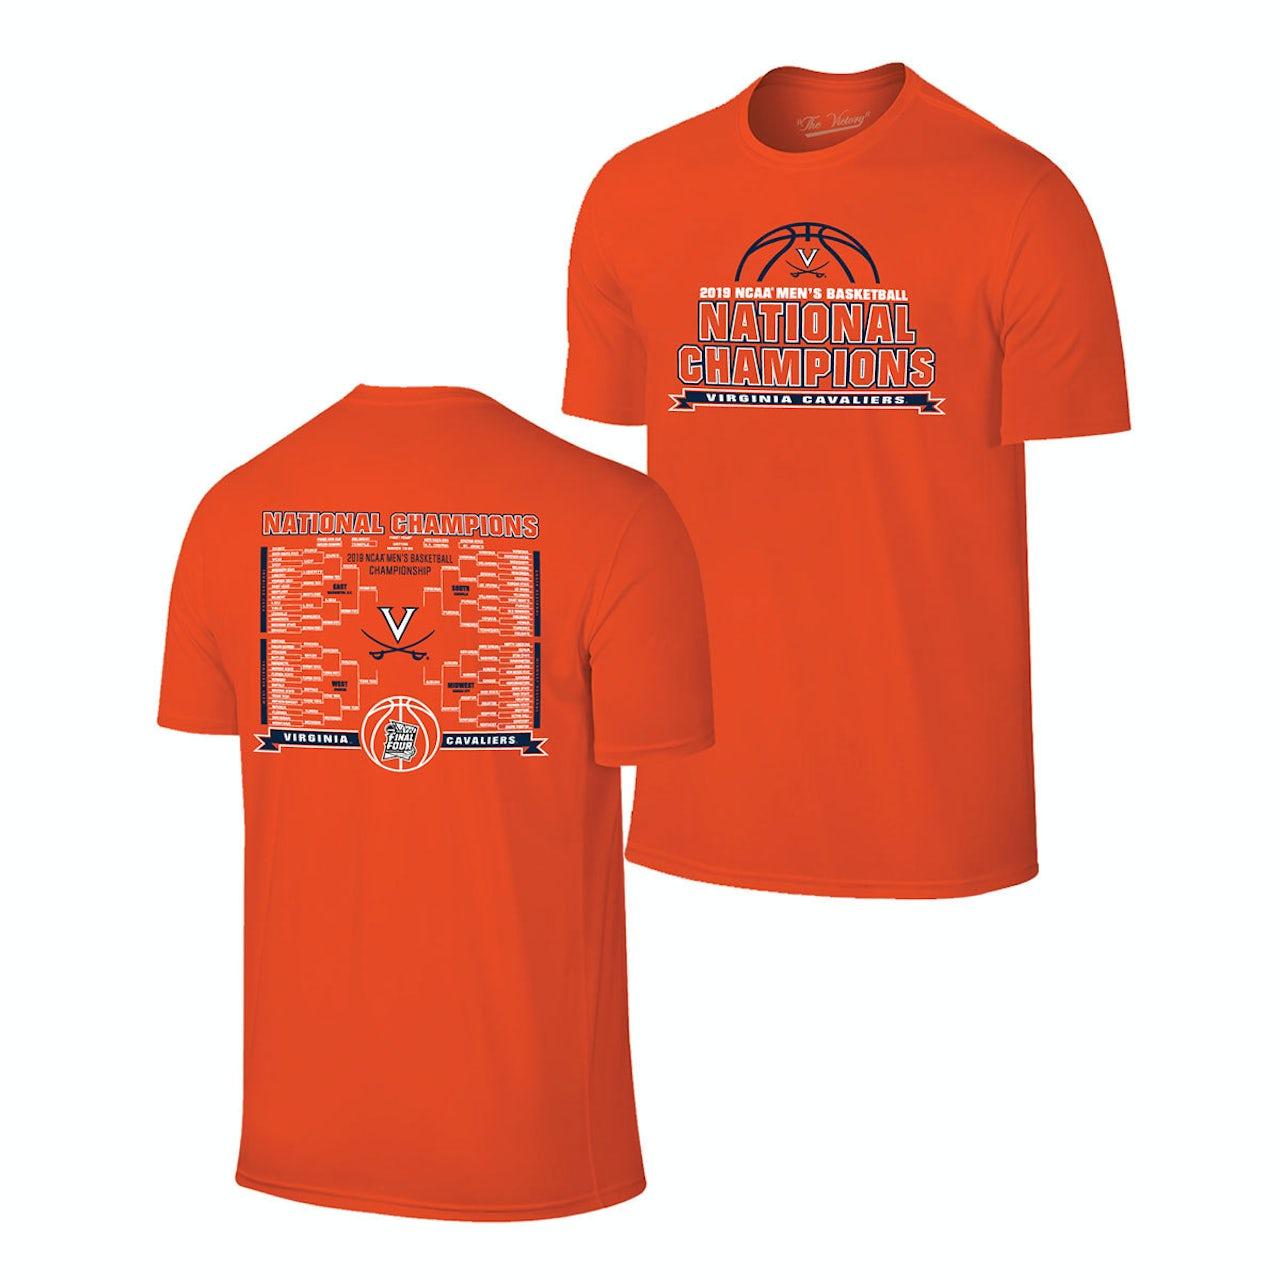 7f48a46ab UVA Athletics 2019 National Champions Bracket T-shirt - Orange